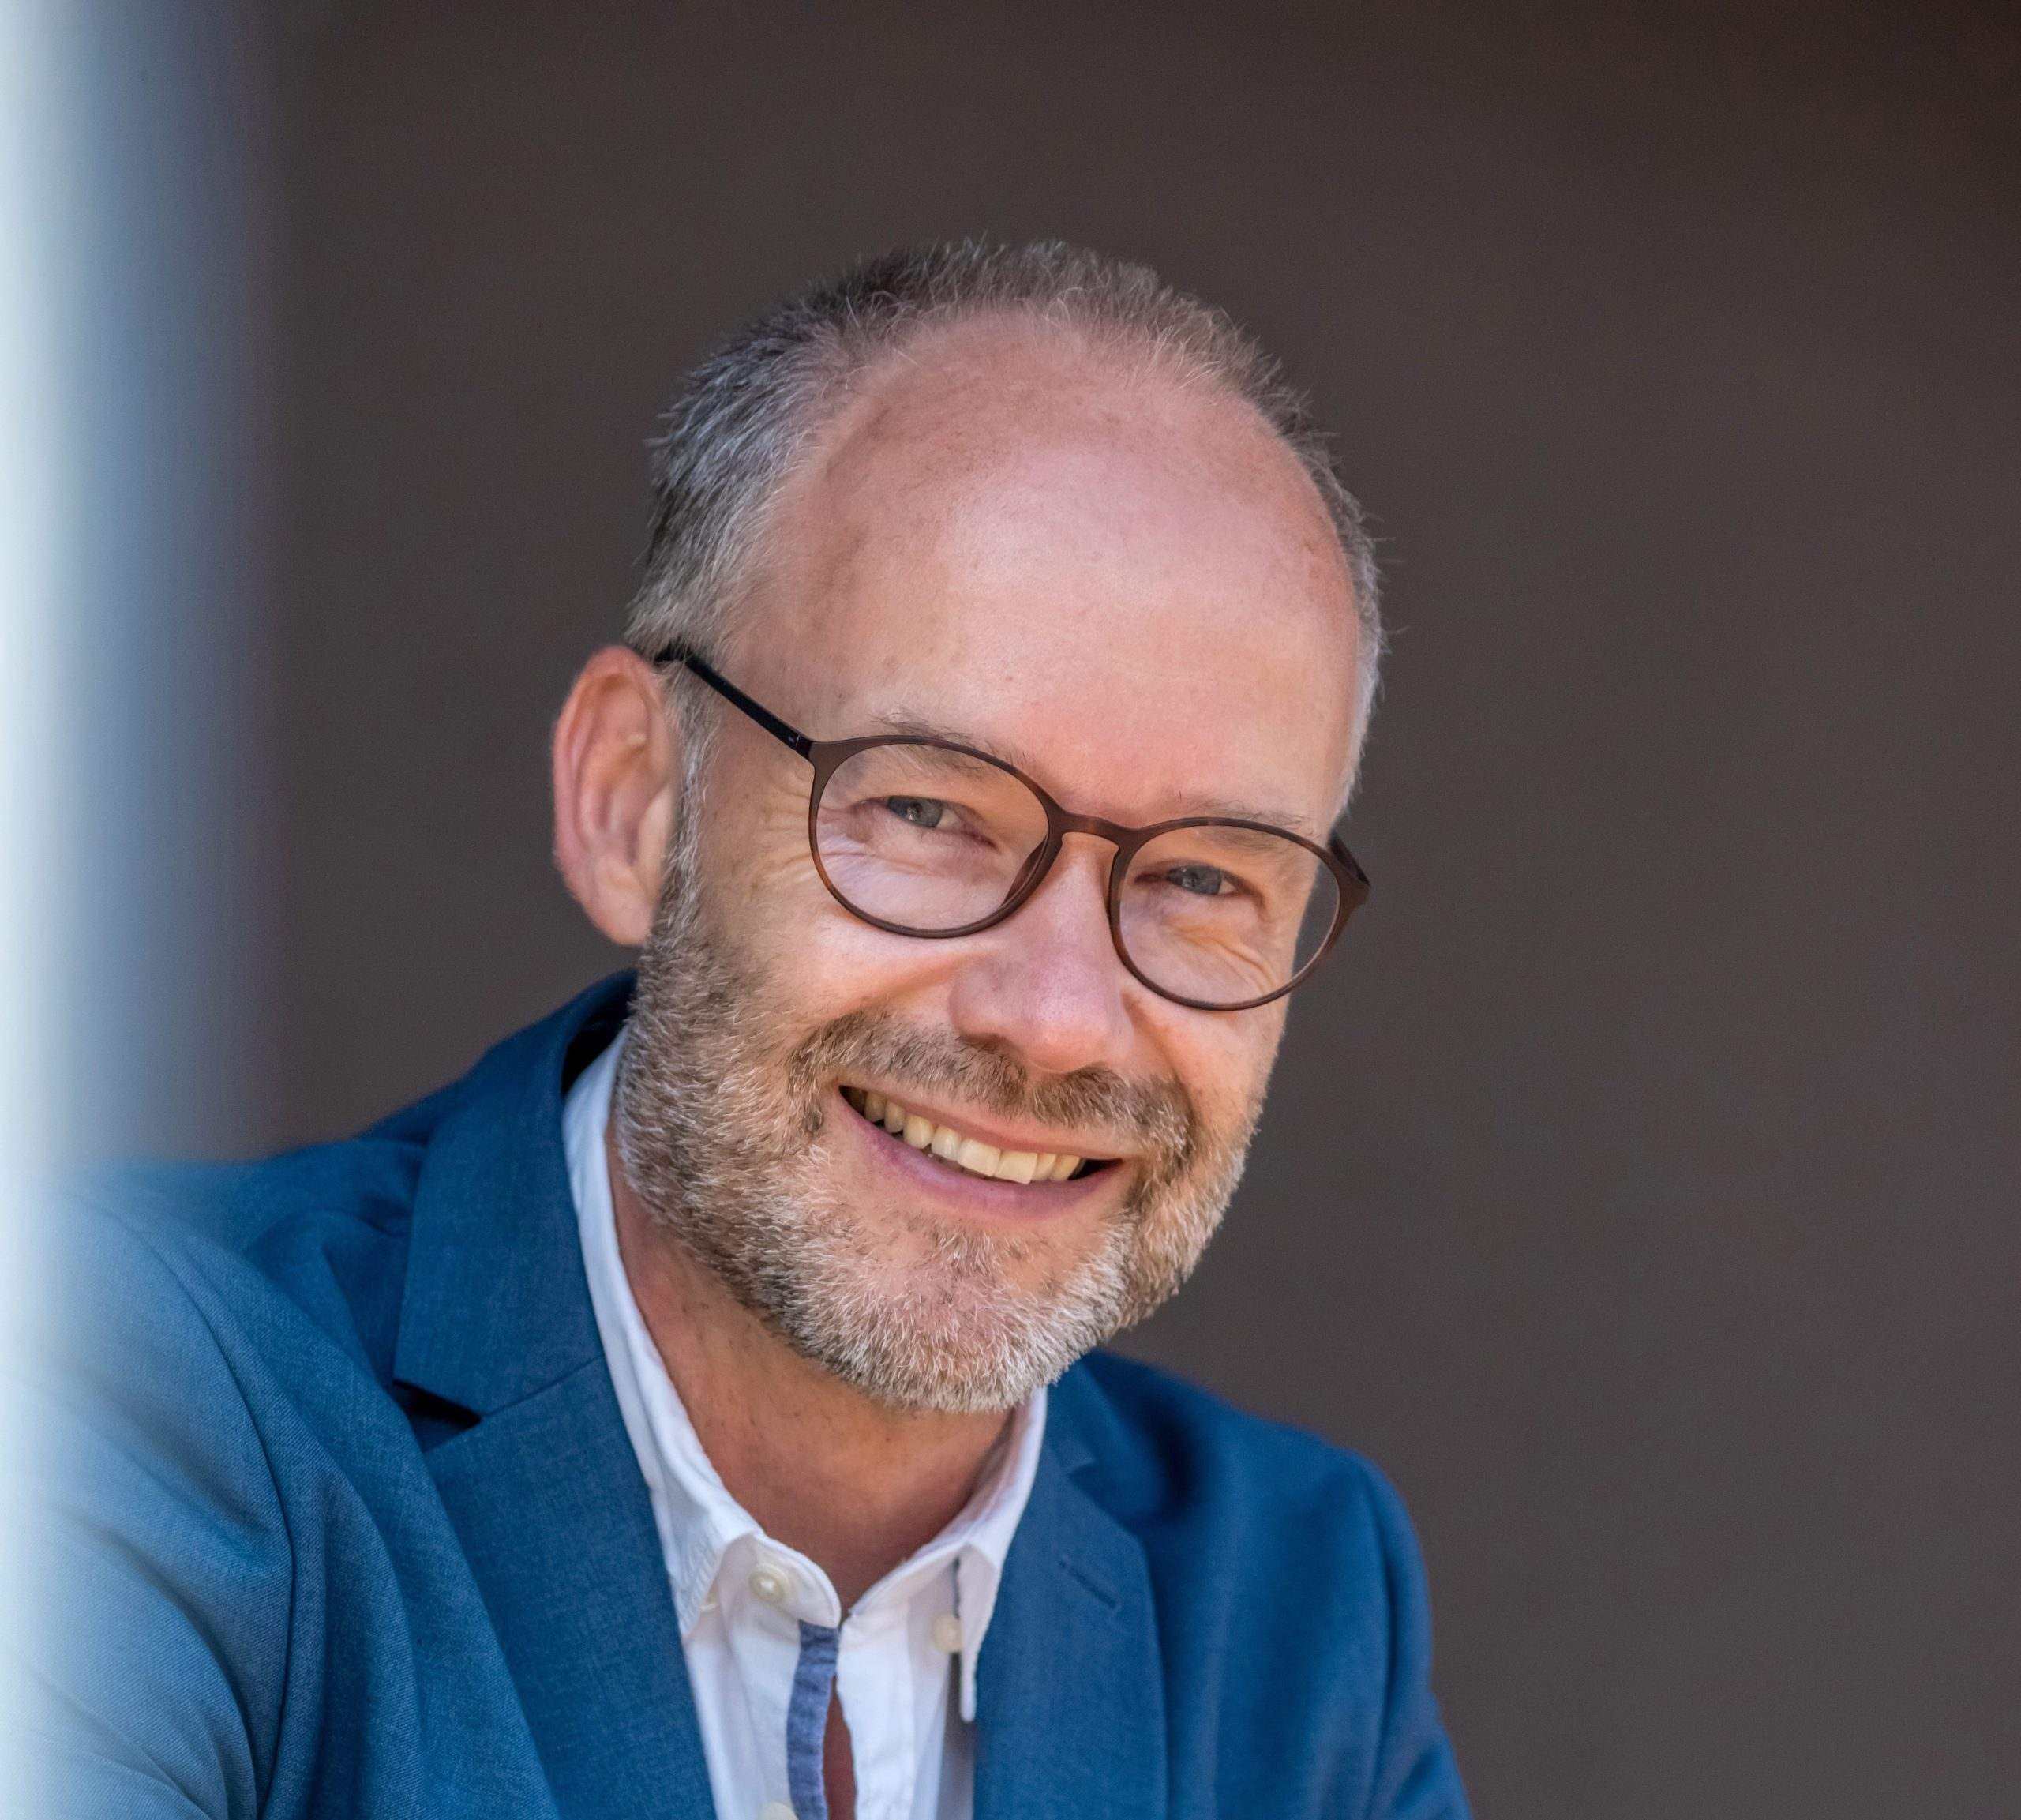 Jürgen Benasseni Diplom-Sachverständiger